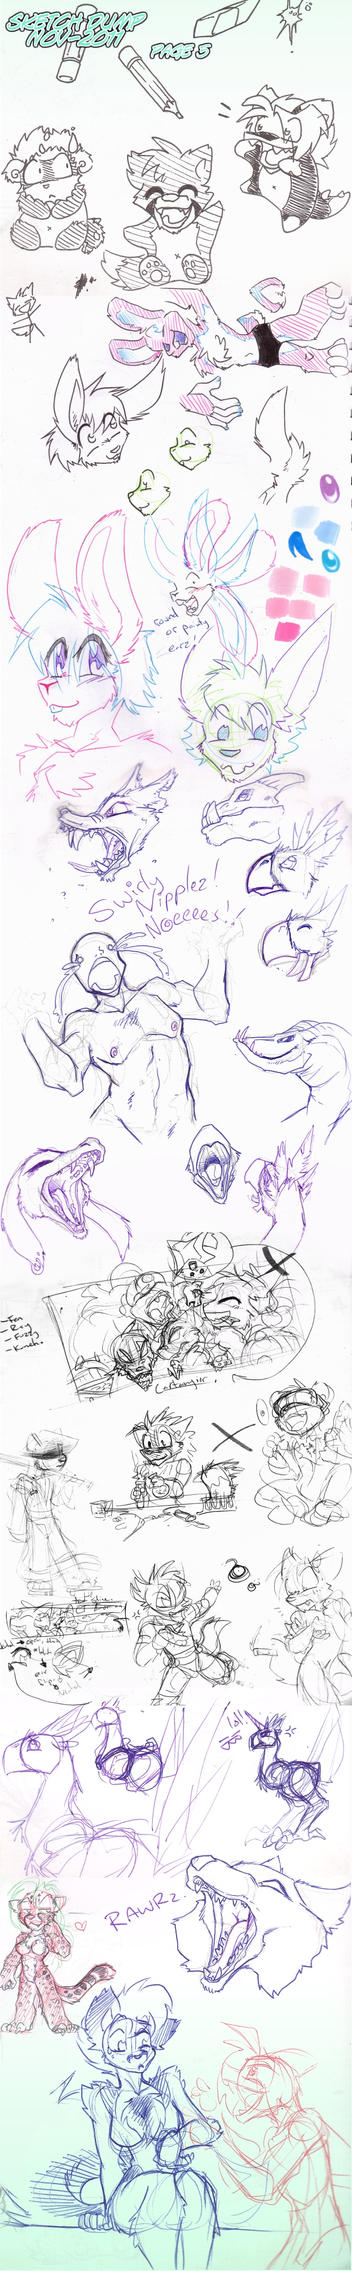 NOV-2011 Sketch.D-Page5 by carnival